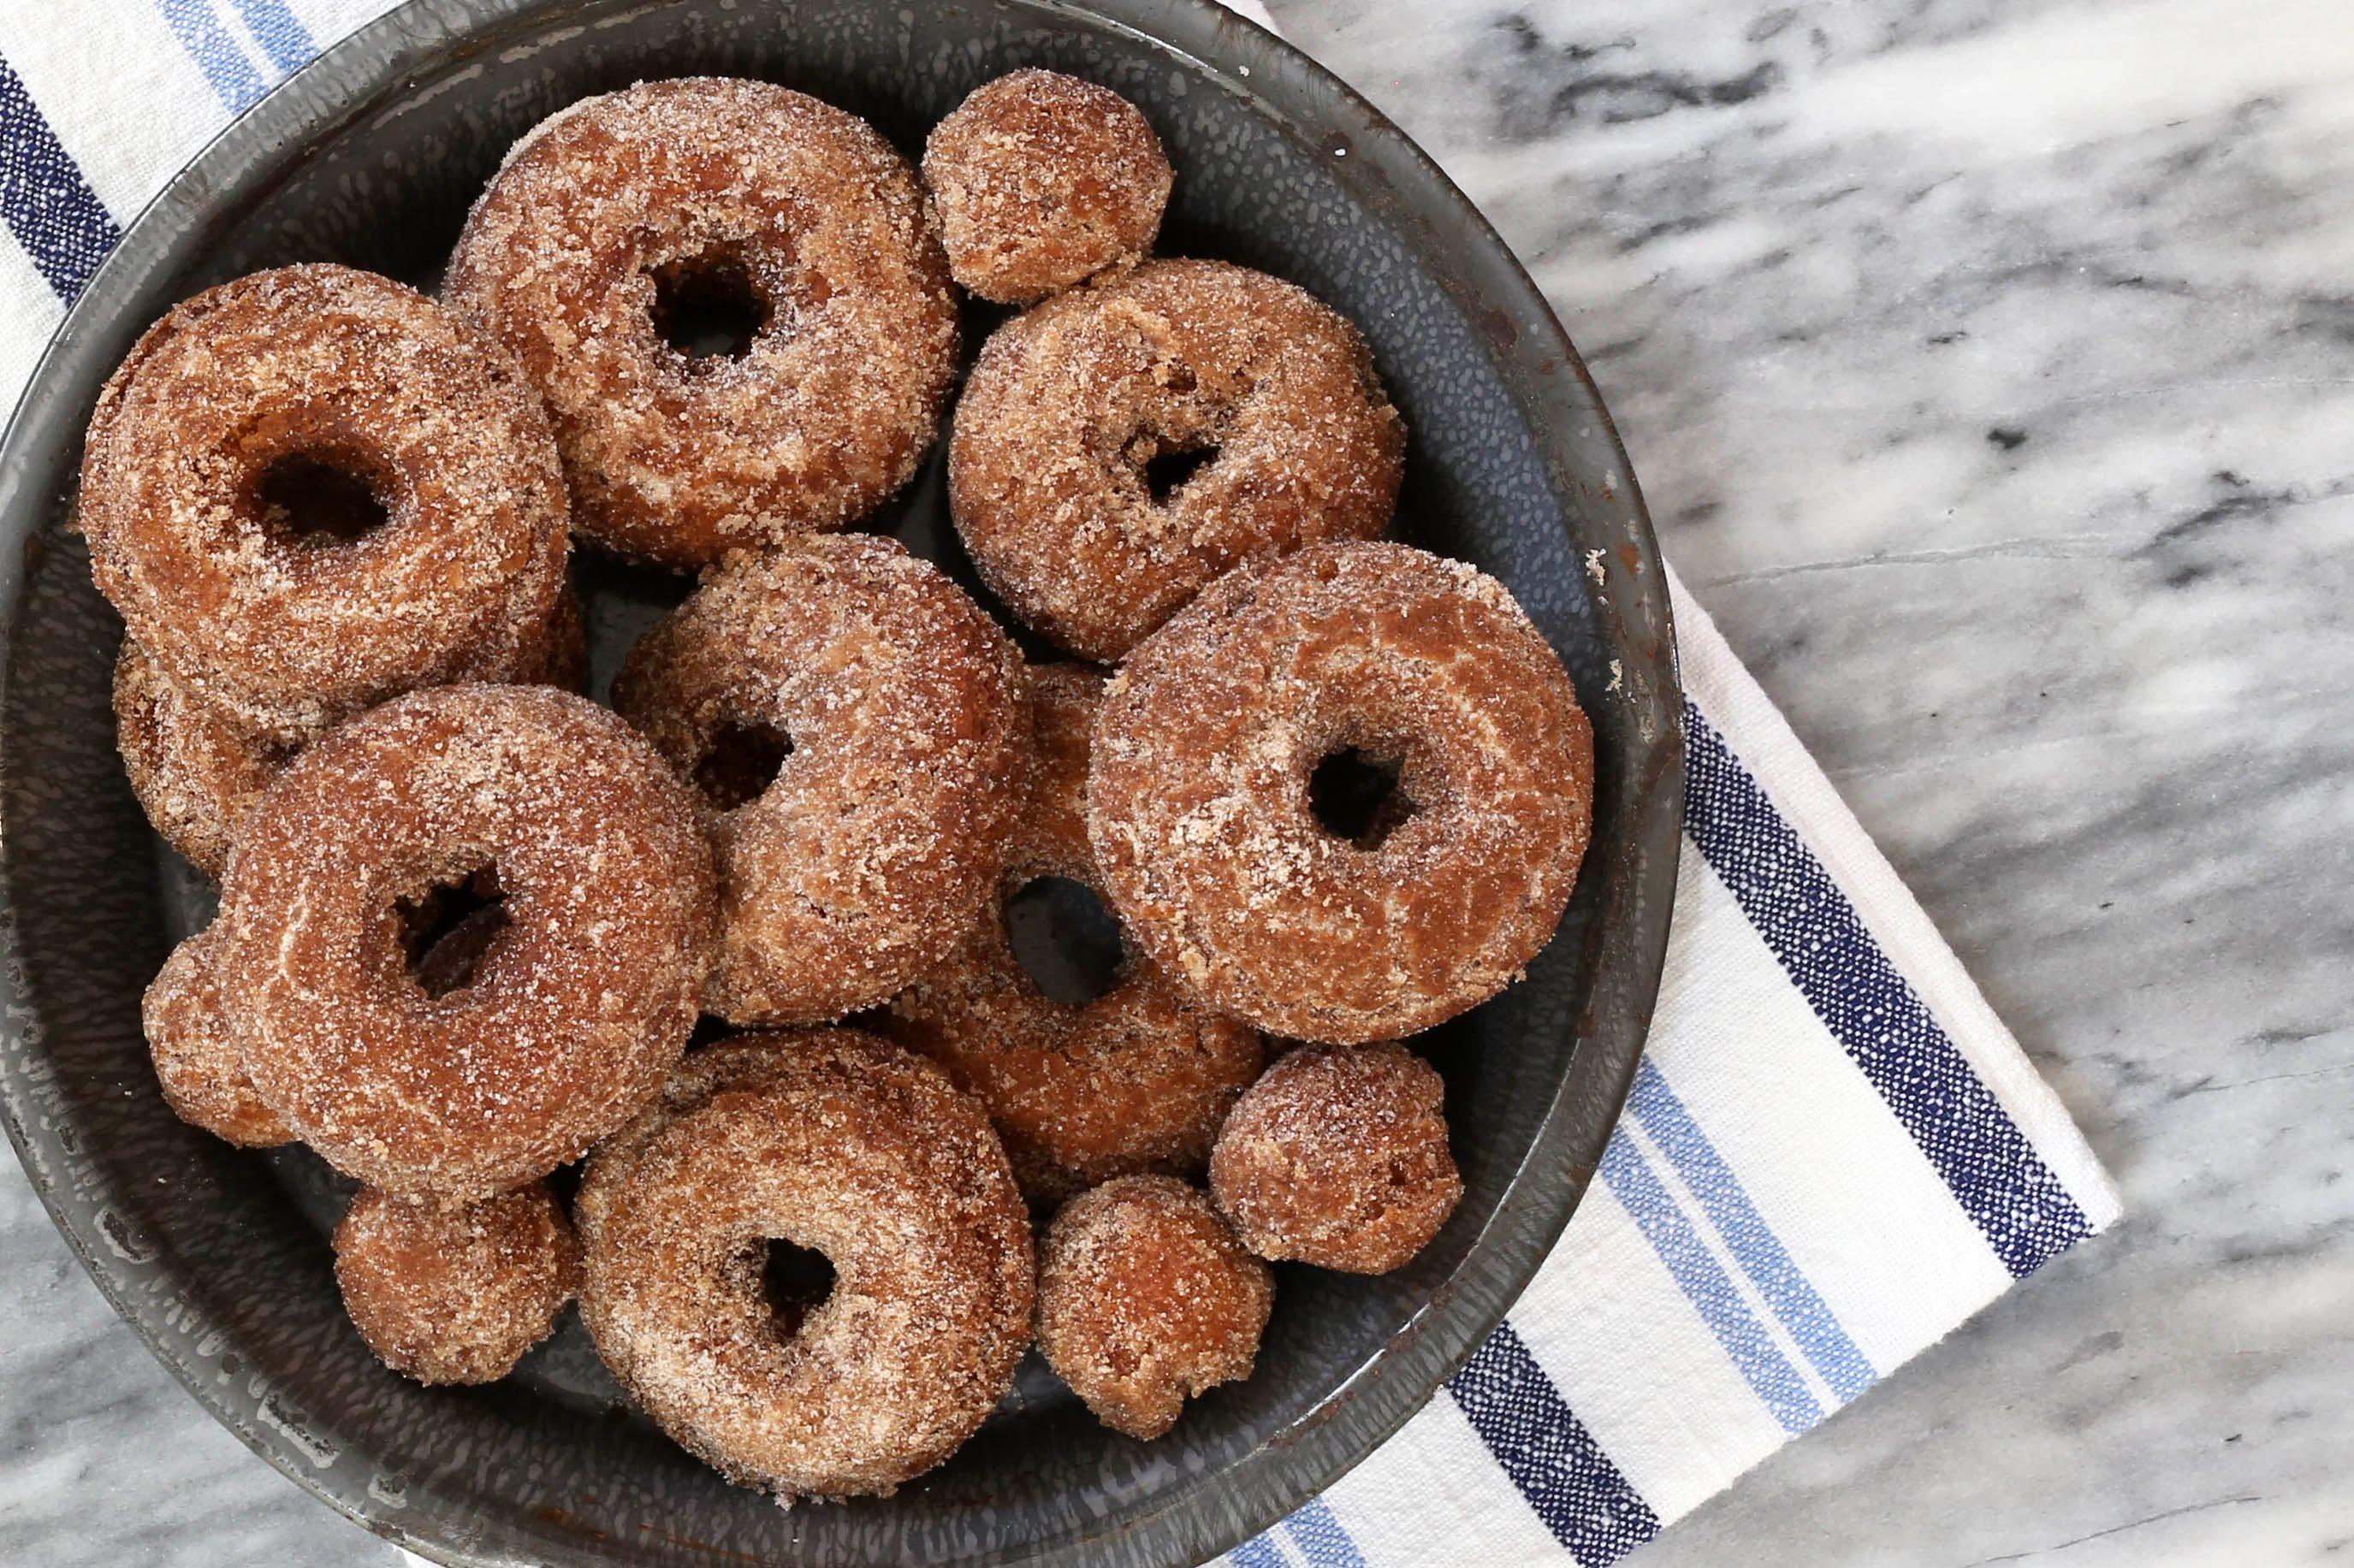 apple cider doughnuts with cinnamon sugar coating